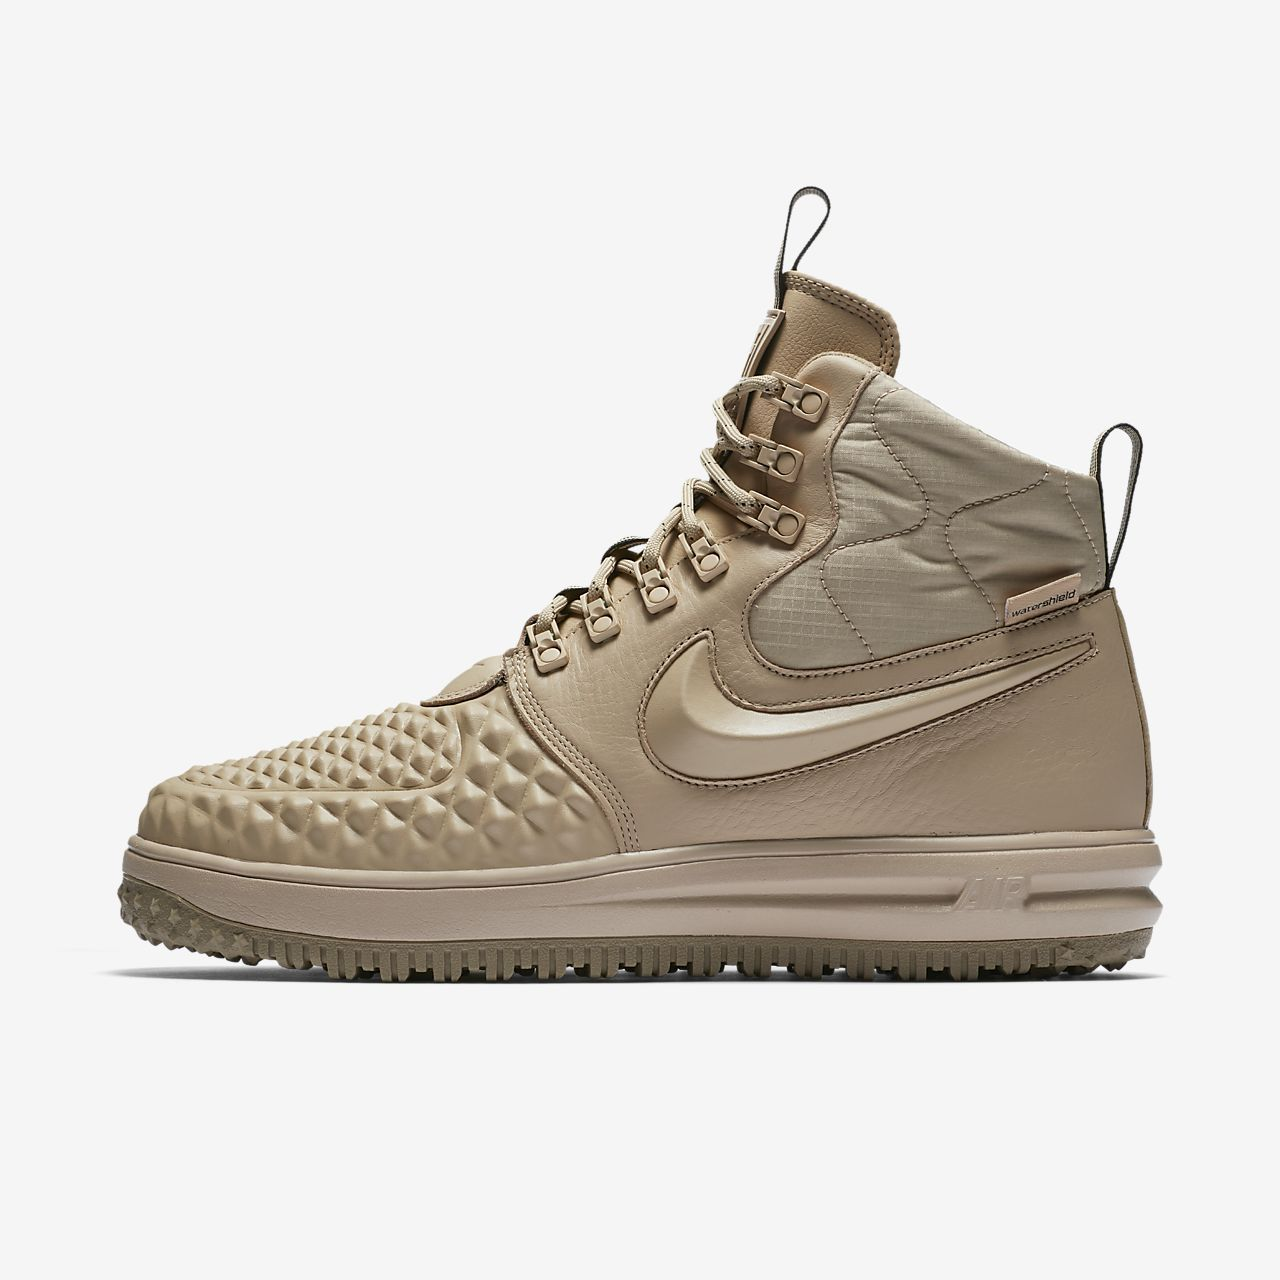 new style 83ca7 1256e Nike Lunar Force 1 Duckboot  17 Men s Boot